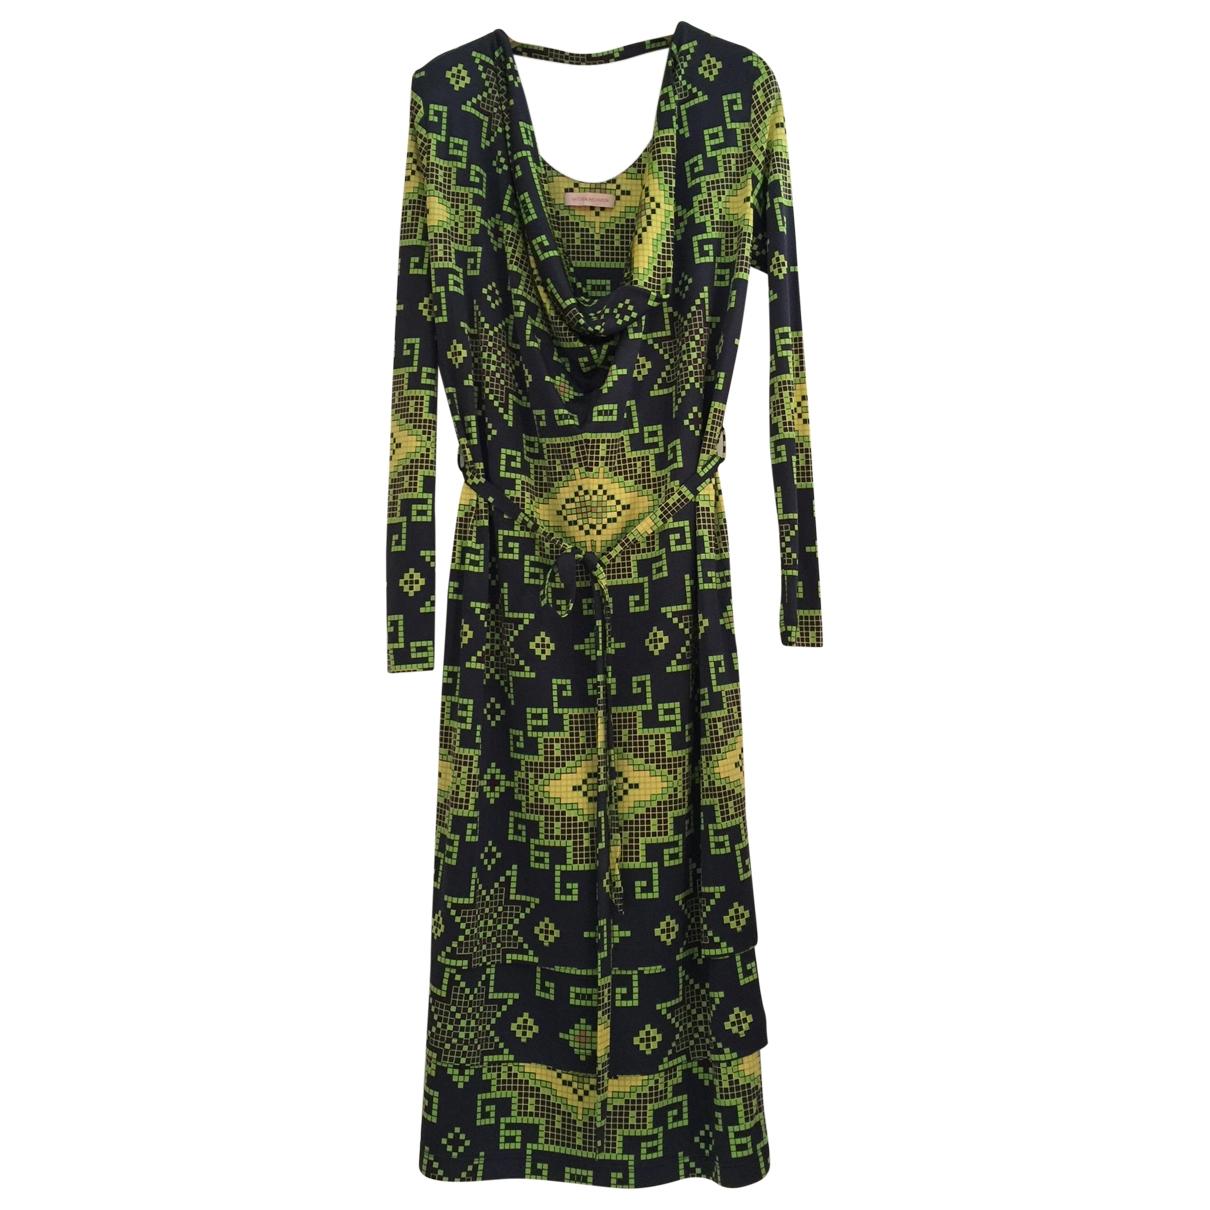 Matthew Williamson \N Multicolour dress for Women M International